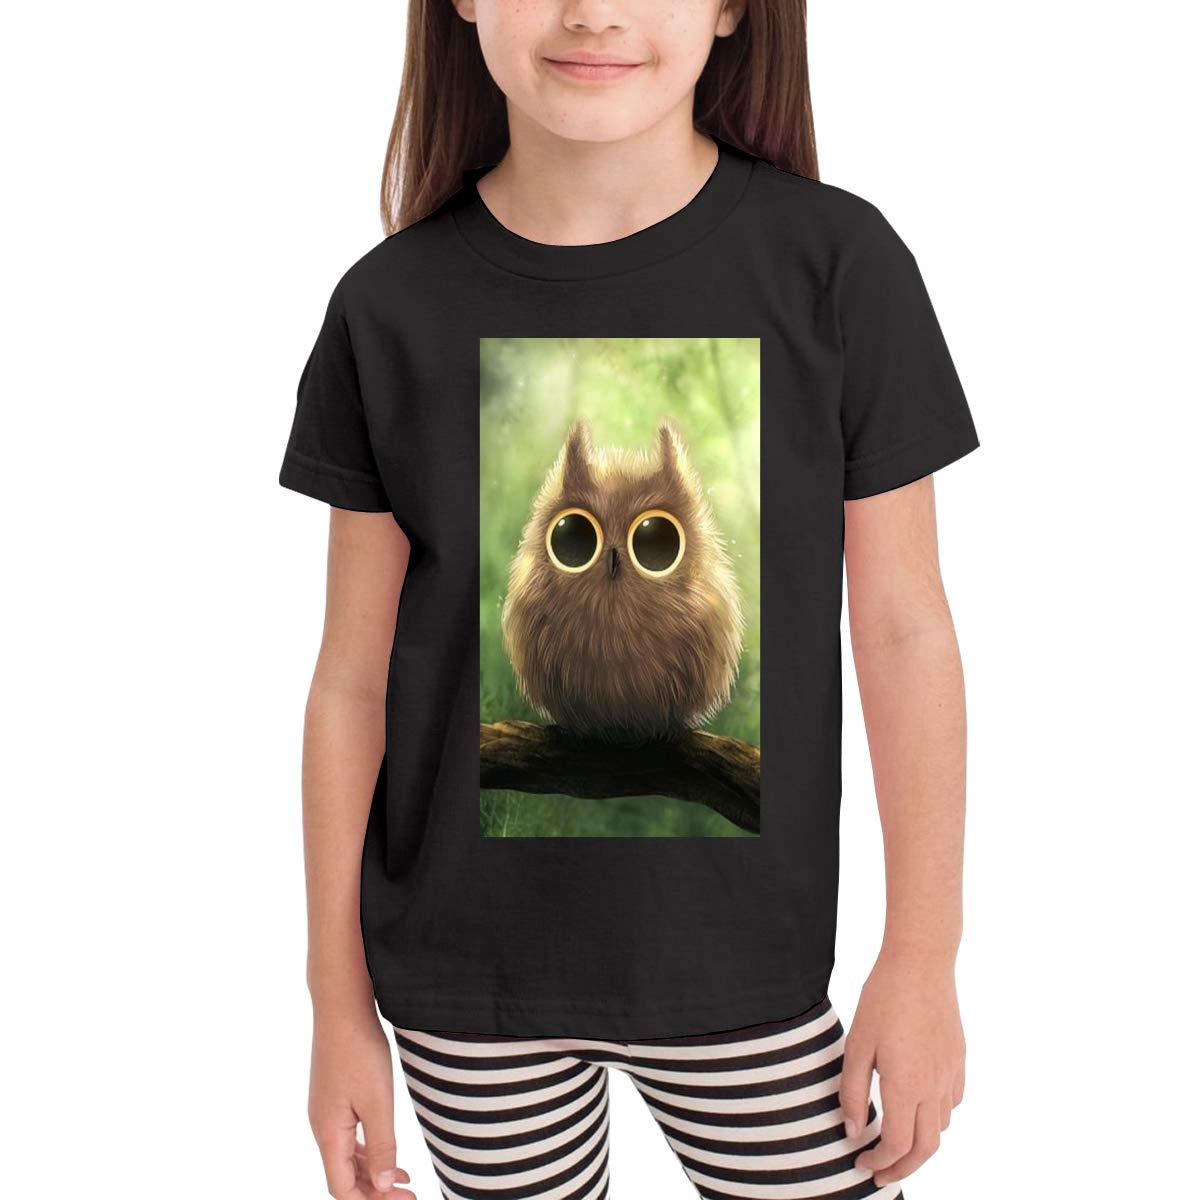 Kawaii Owl Eyes 100/% Organic Cotton Toddler Baby Boys Girls Kids Short Sleeve T Shirt Top Tee Clothes 2-6 T